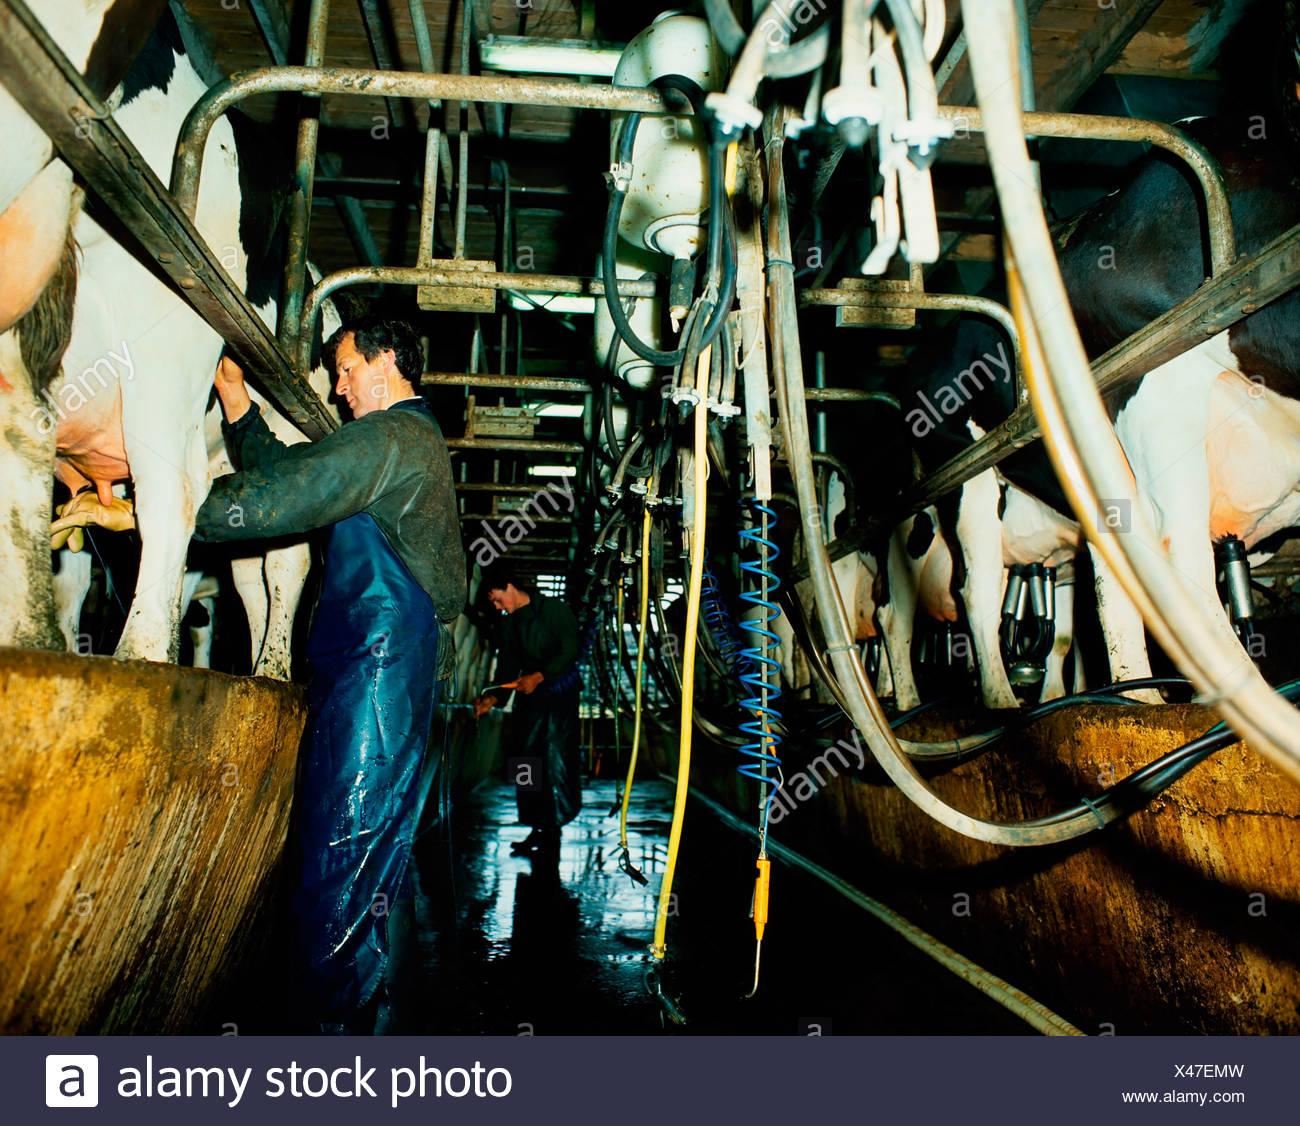 Milking Parlour, Ireland - Stock Image